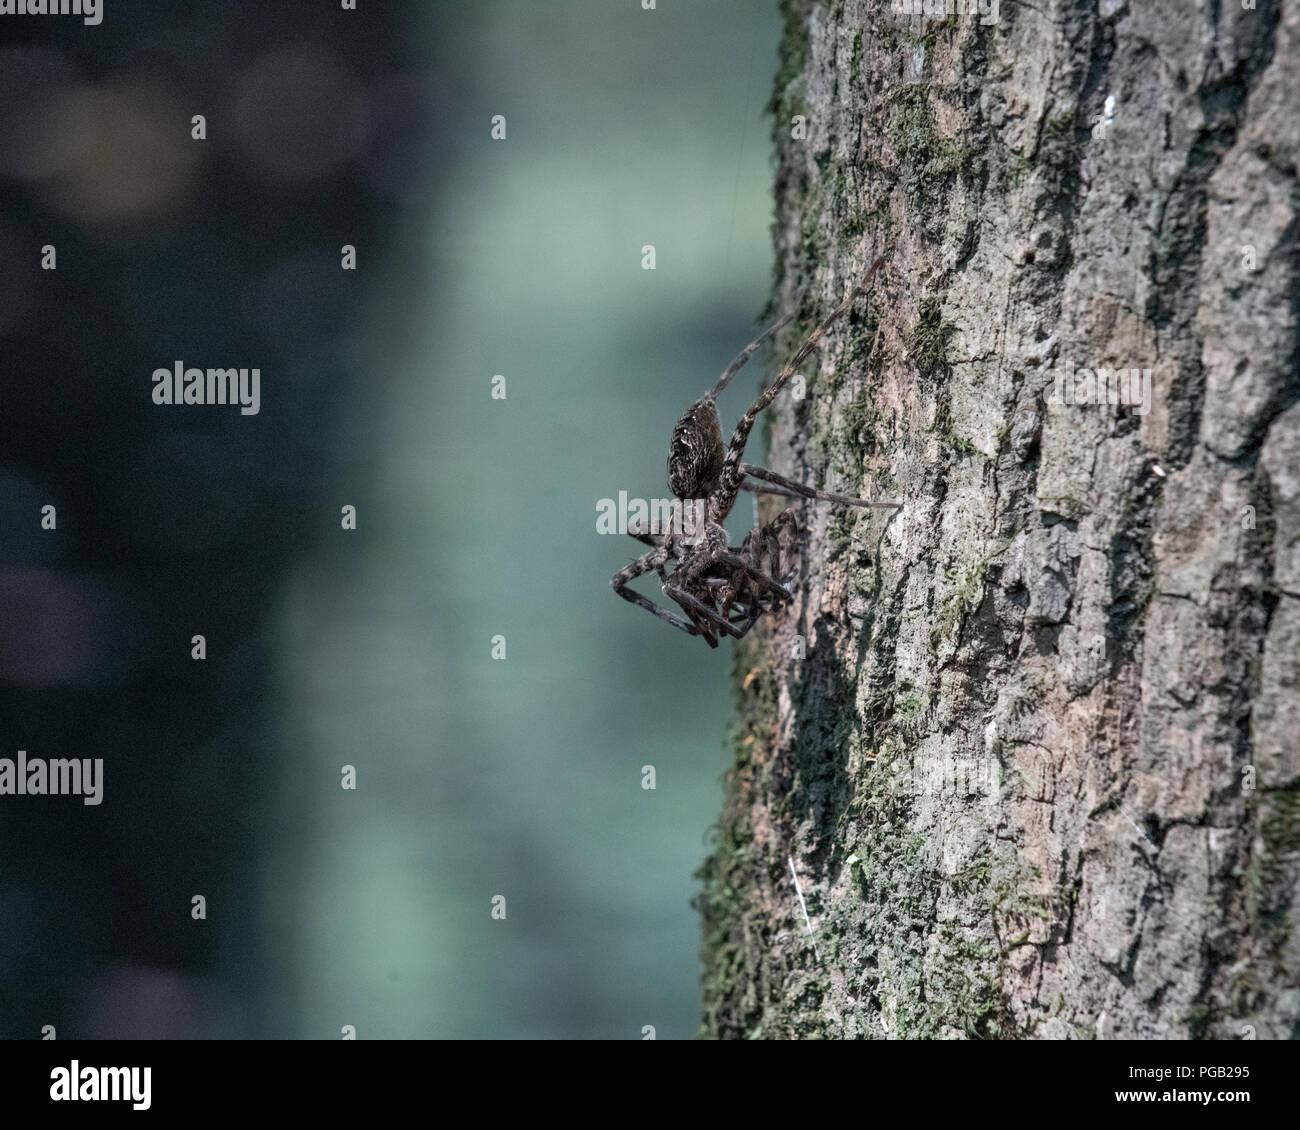 Juvenile whitebanded fishing spider waits for prey on a tree in Shalotte North Carolina United States - Stock Image